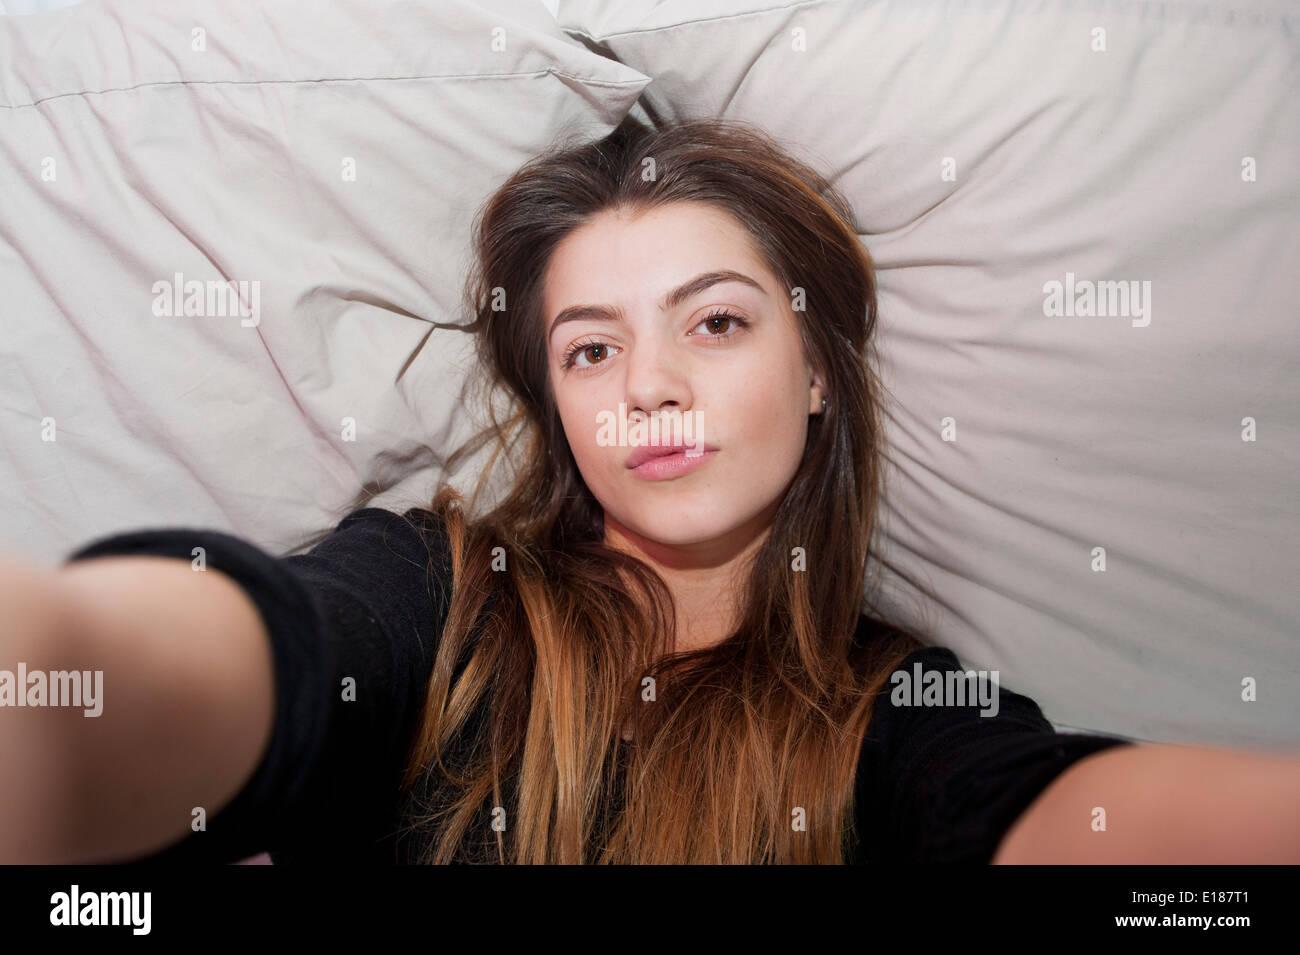 12 jähriges mädchen selfie